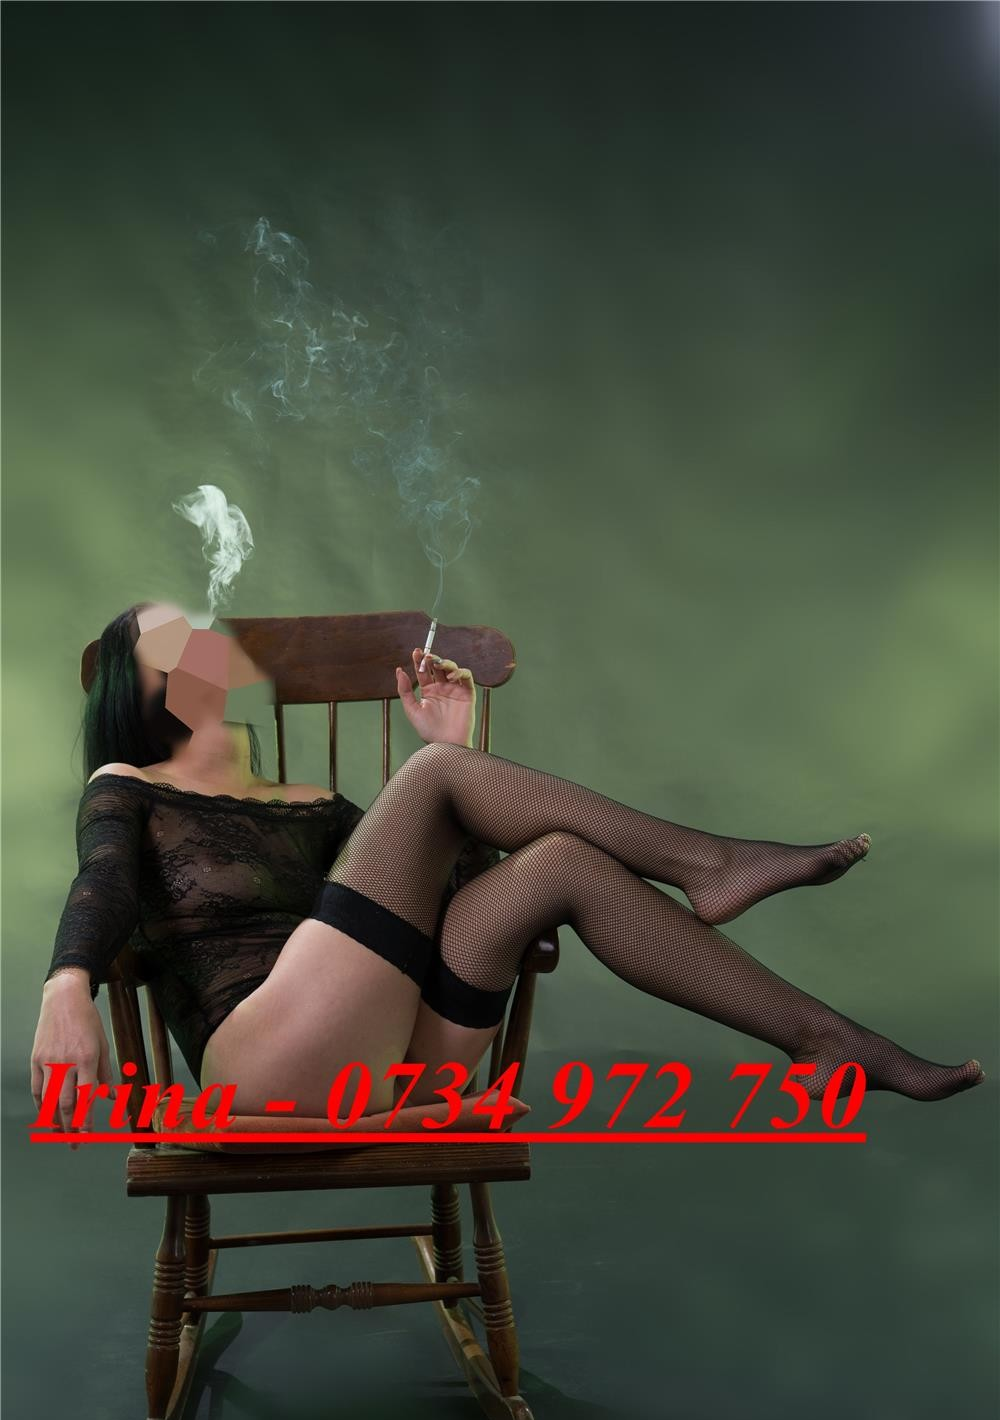 bbf839515e5a8d2271fda1f1bef0a308